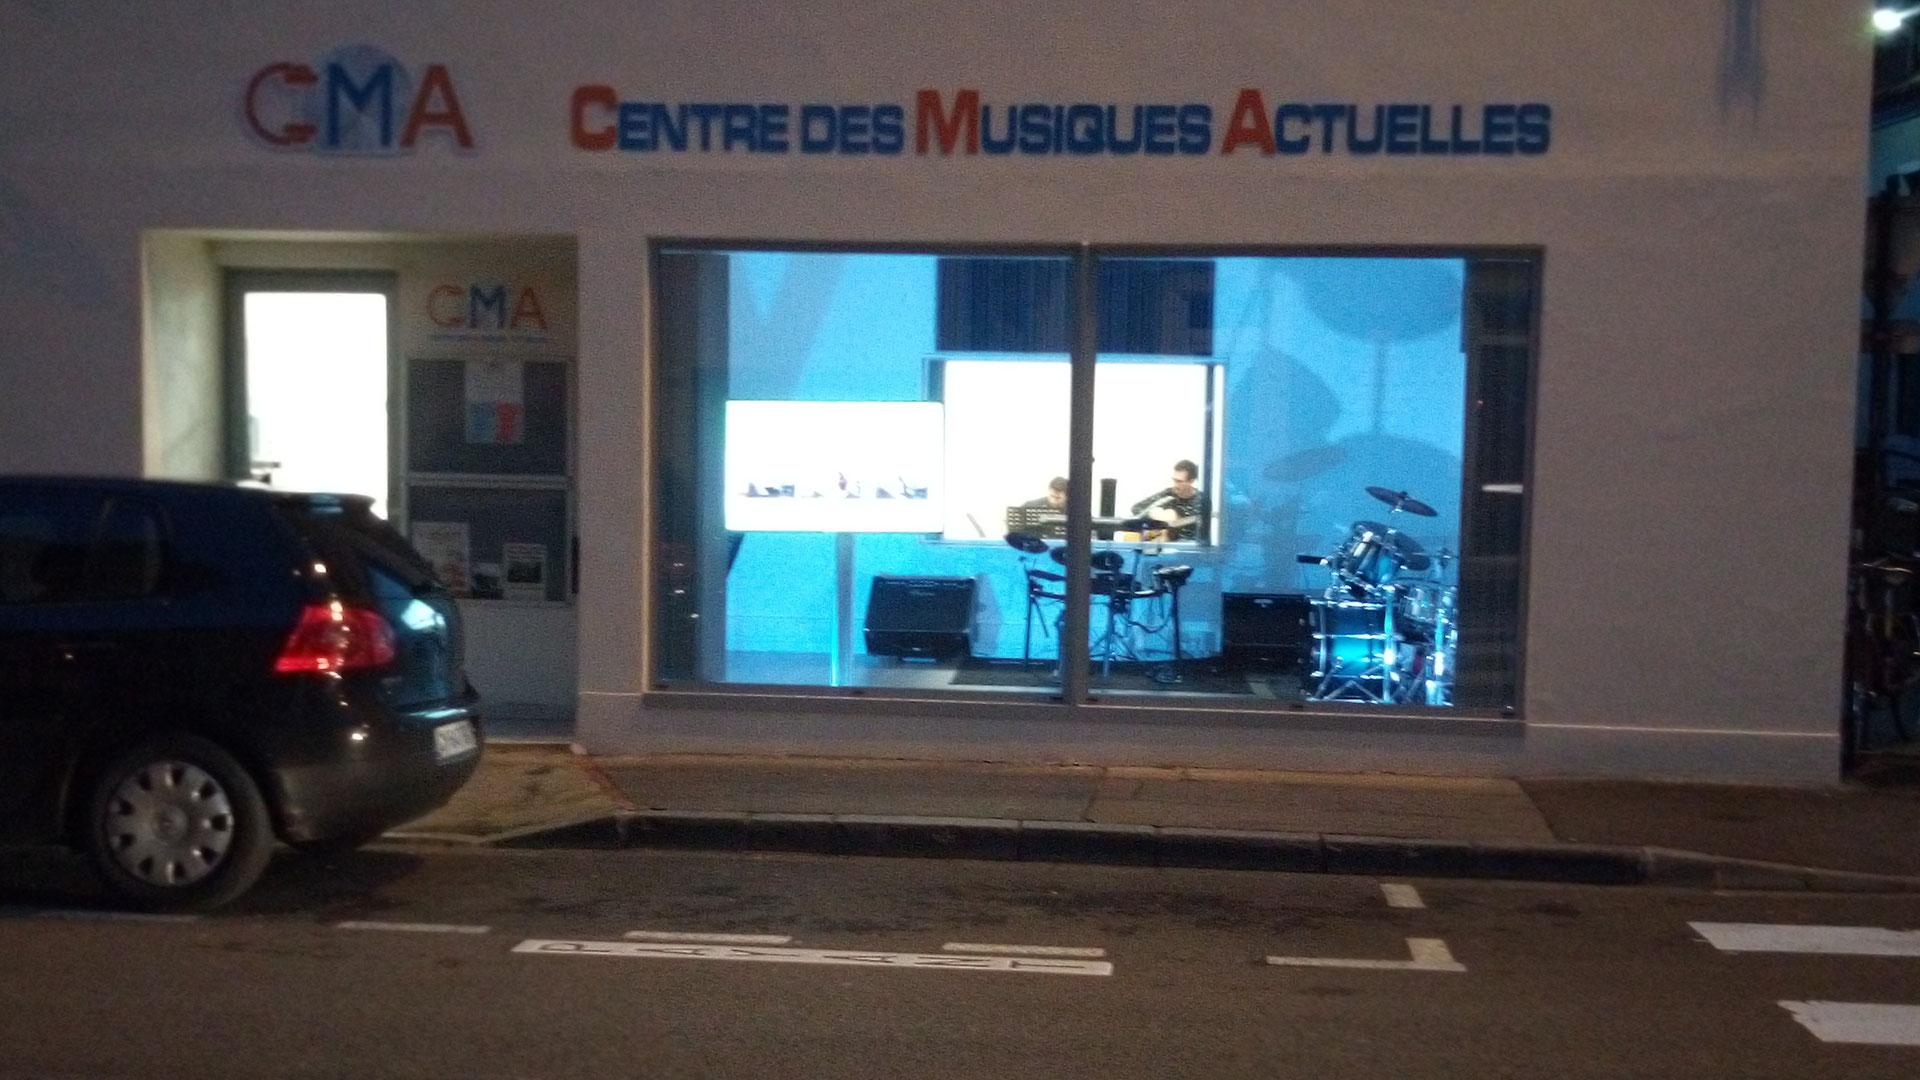 (c) Cma-pau.fr